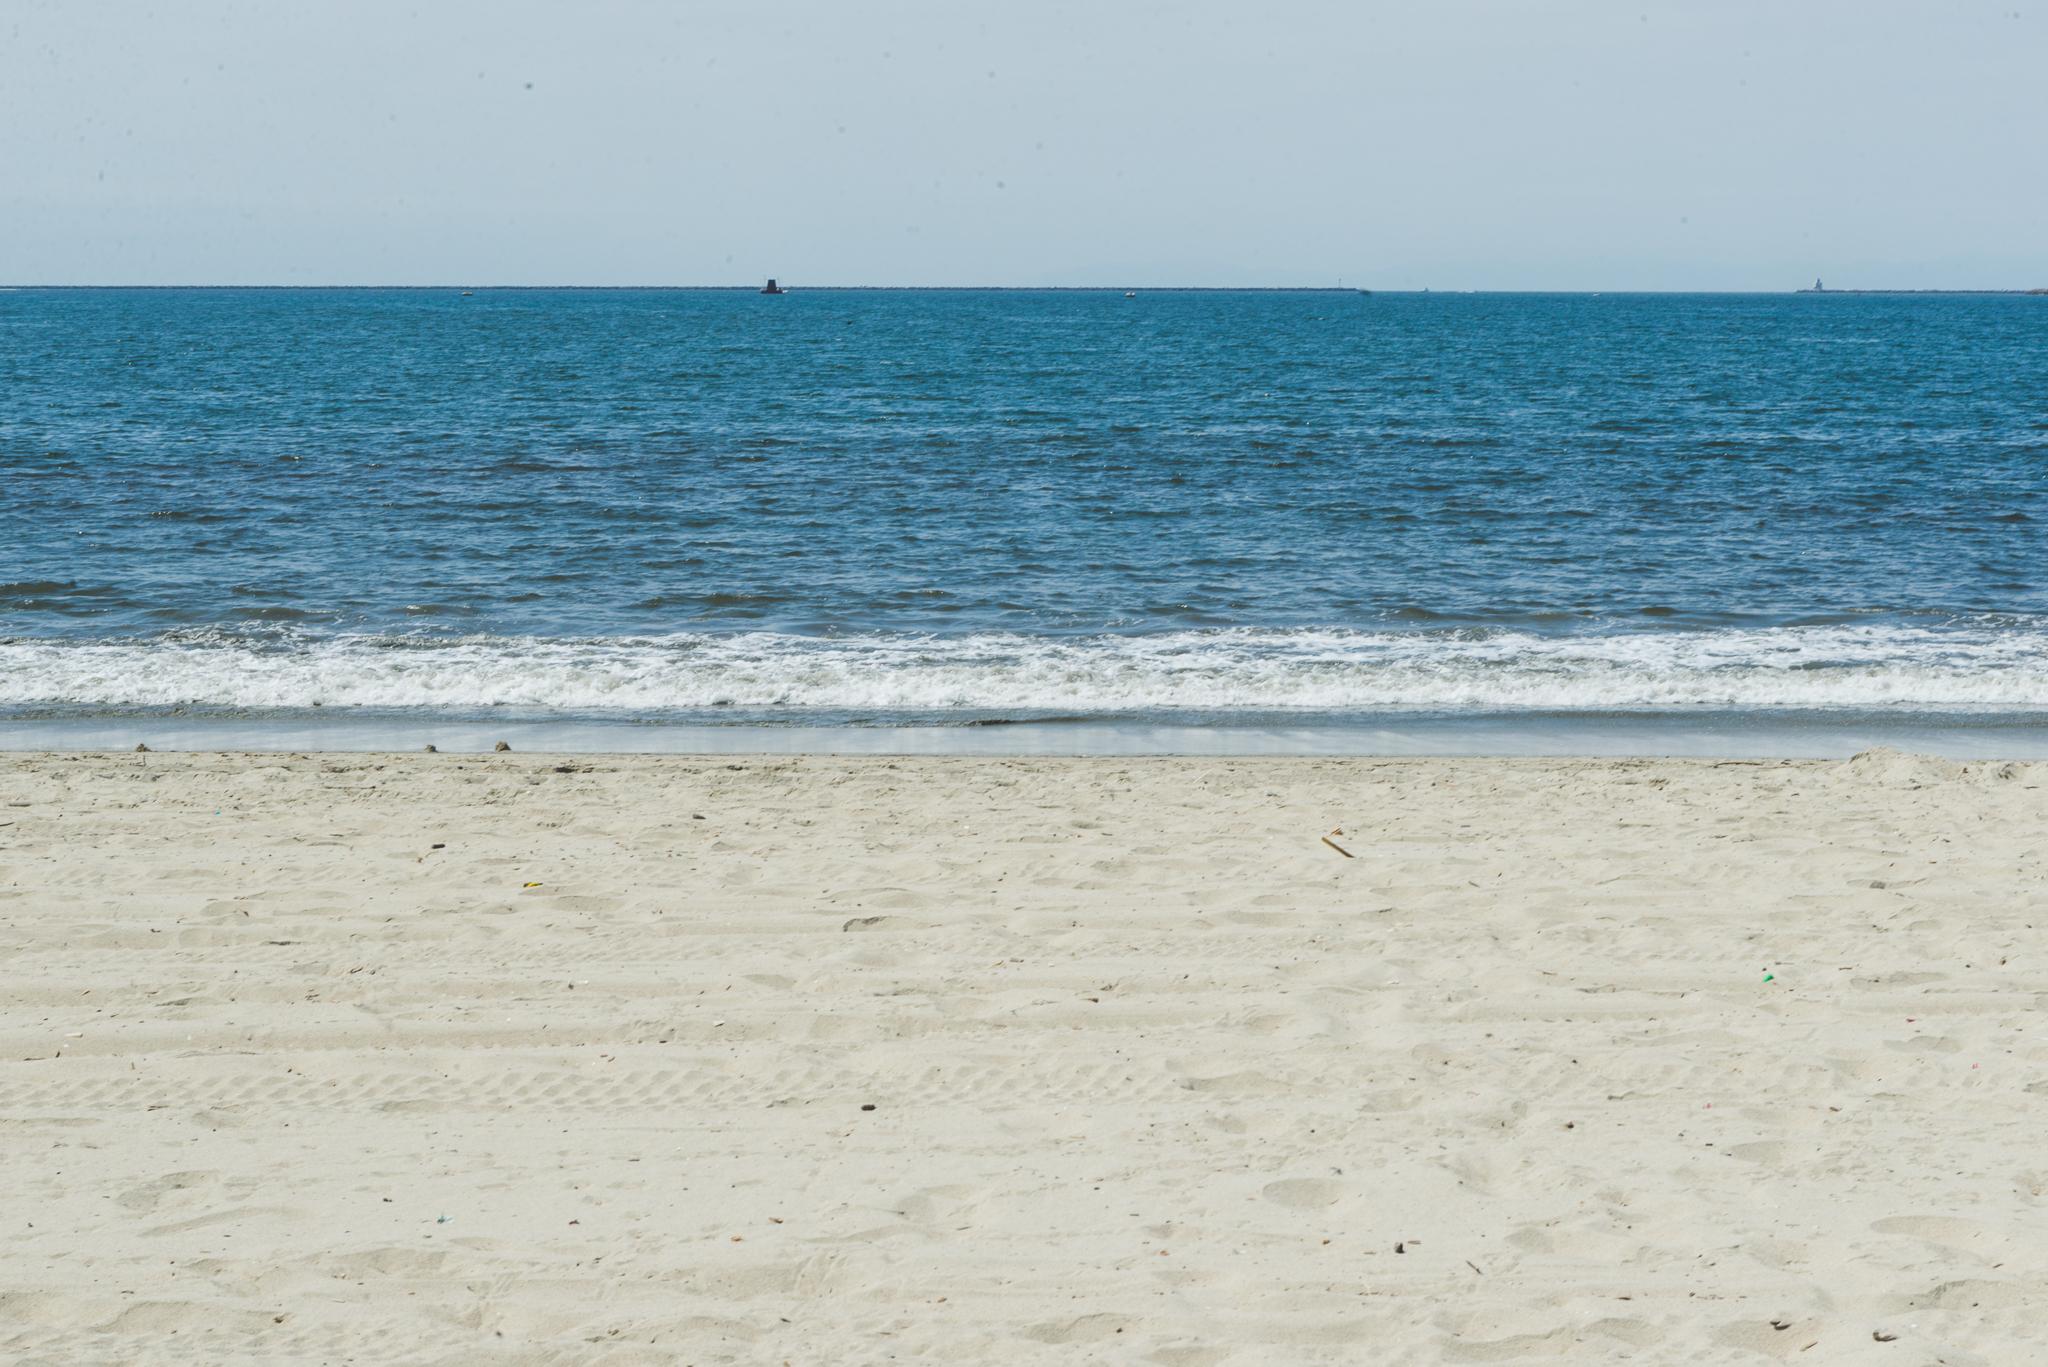 The ocean is so peaceful. / 5/14/16 / Long Beach, CA